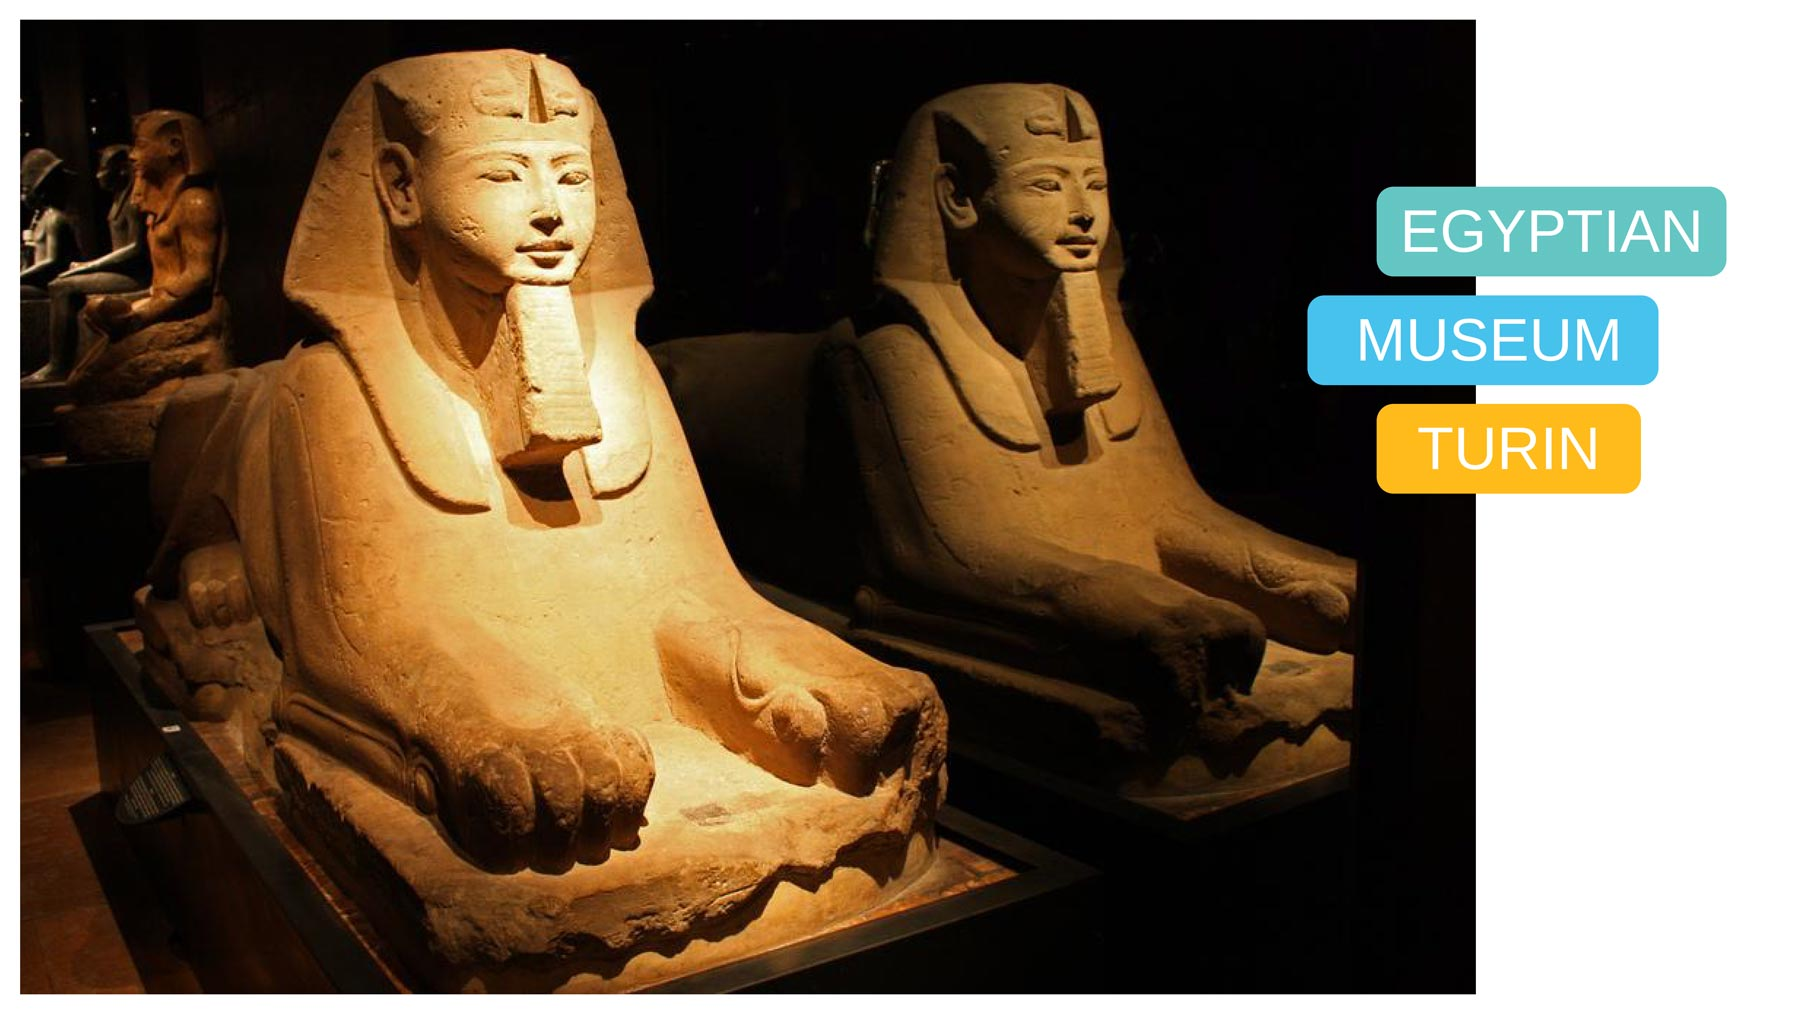 The-Road-to-Egypt-egyptian-museum-bike-tour-turin-2